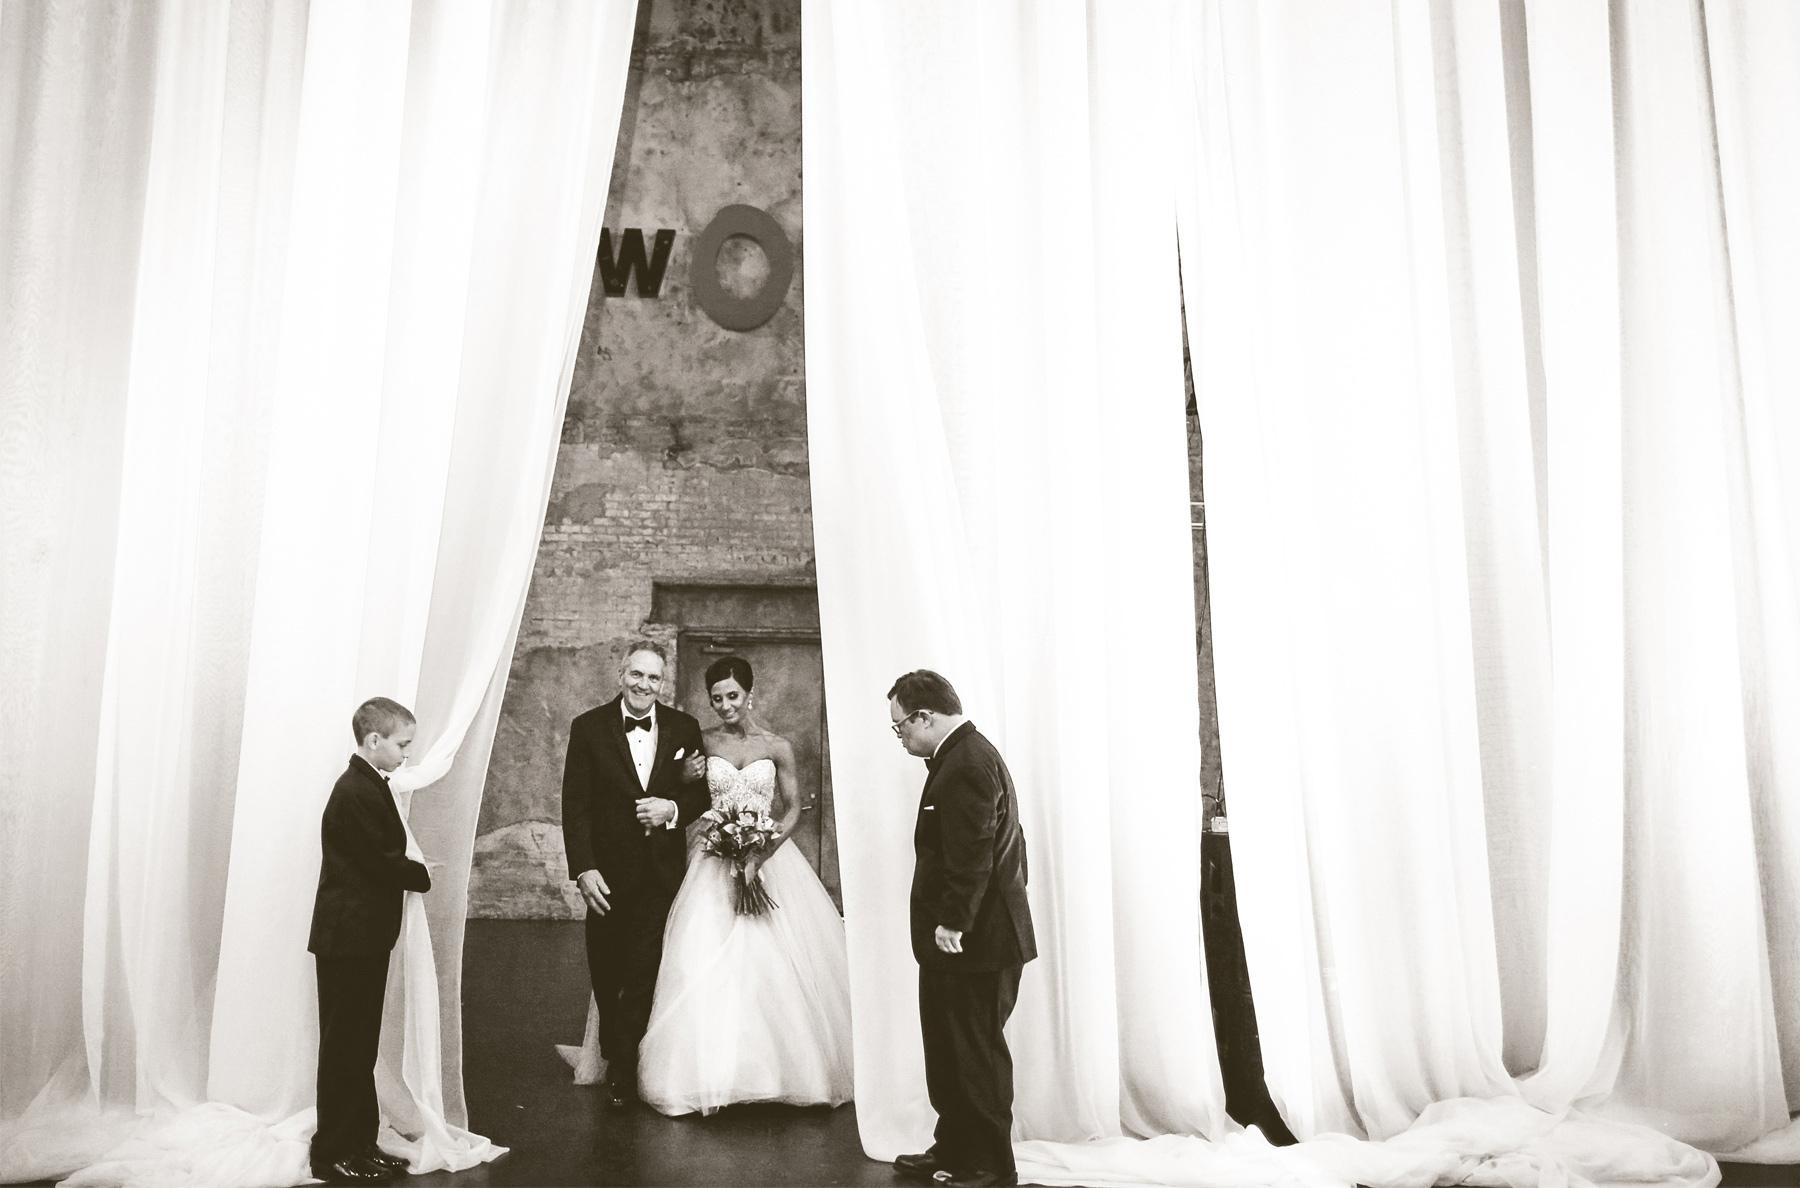 10-Minneapolis-Minnesota-Wedding-Photography-Aria-Downtown-Industrial-Ceremony-Melanie-and-Andrew.jpg